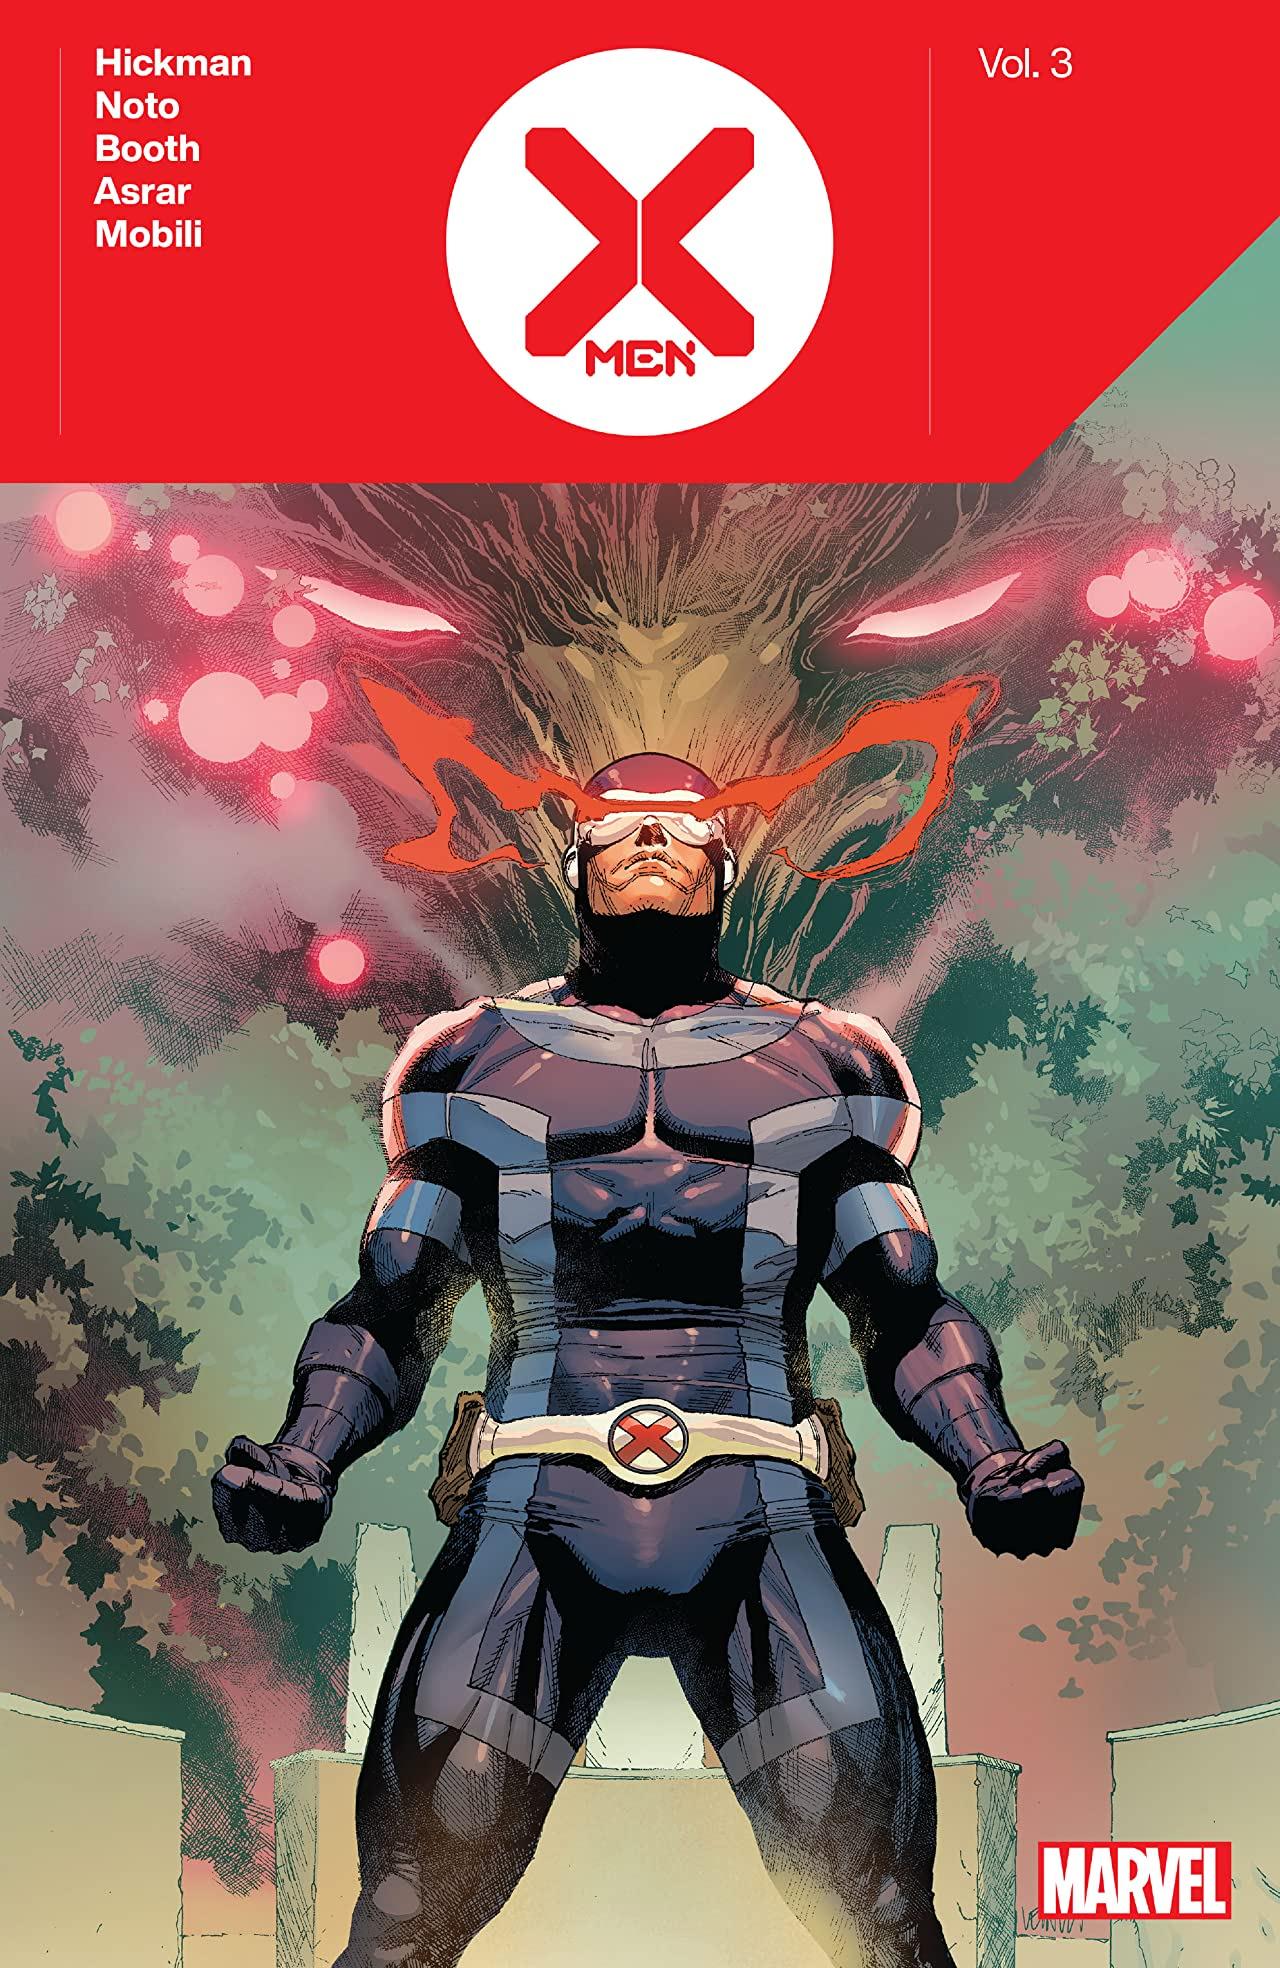 X-Men by Jonathan Hickman, Vol. 3